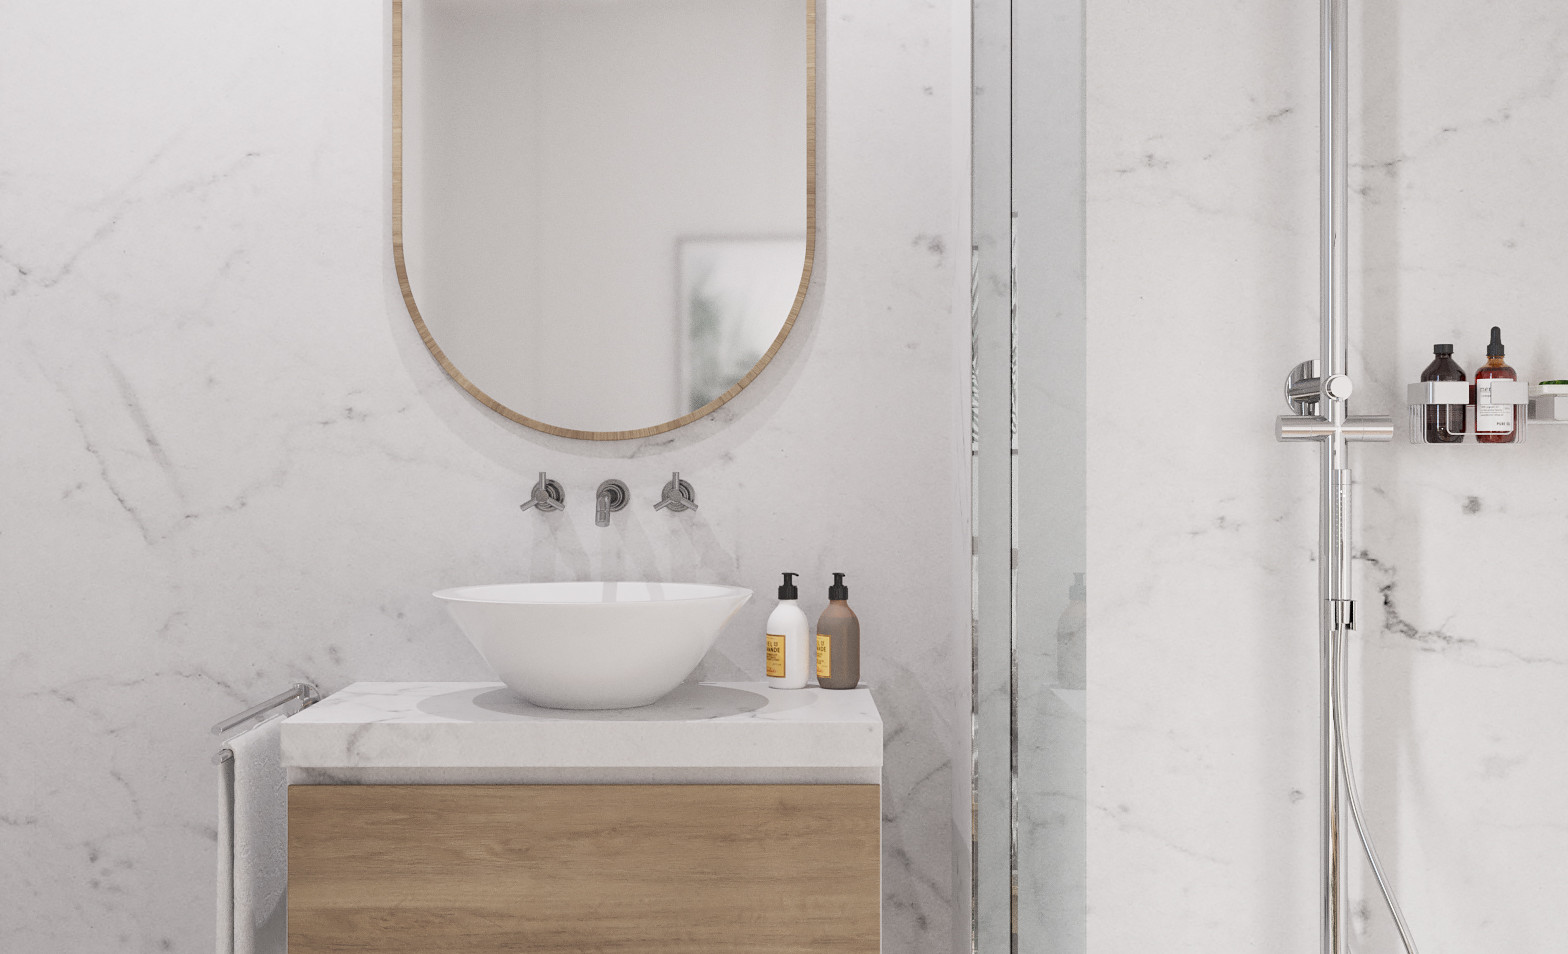 Villamoura_Ap 16_Bedroom 1_Bathroom